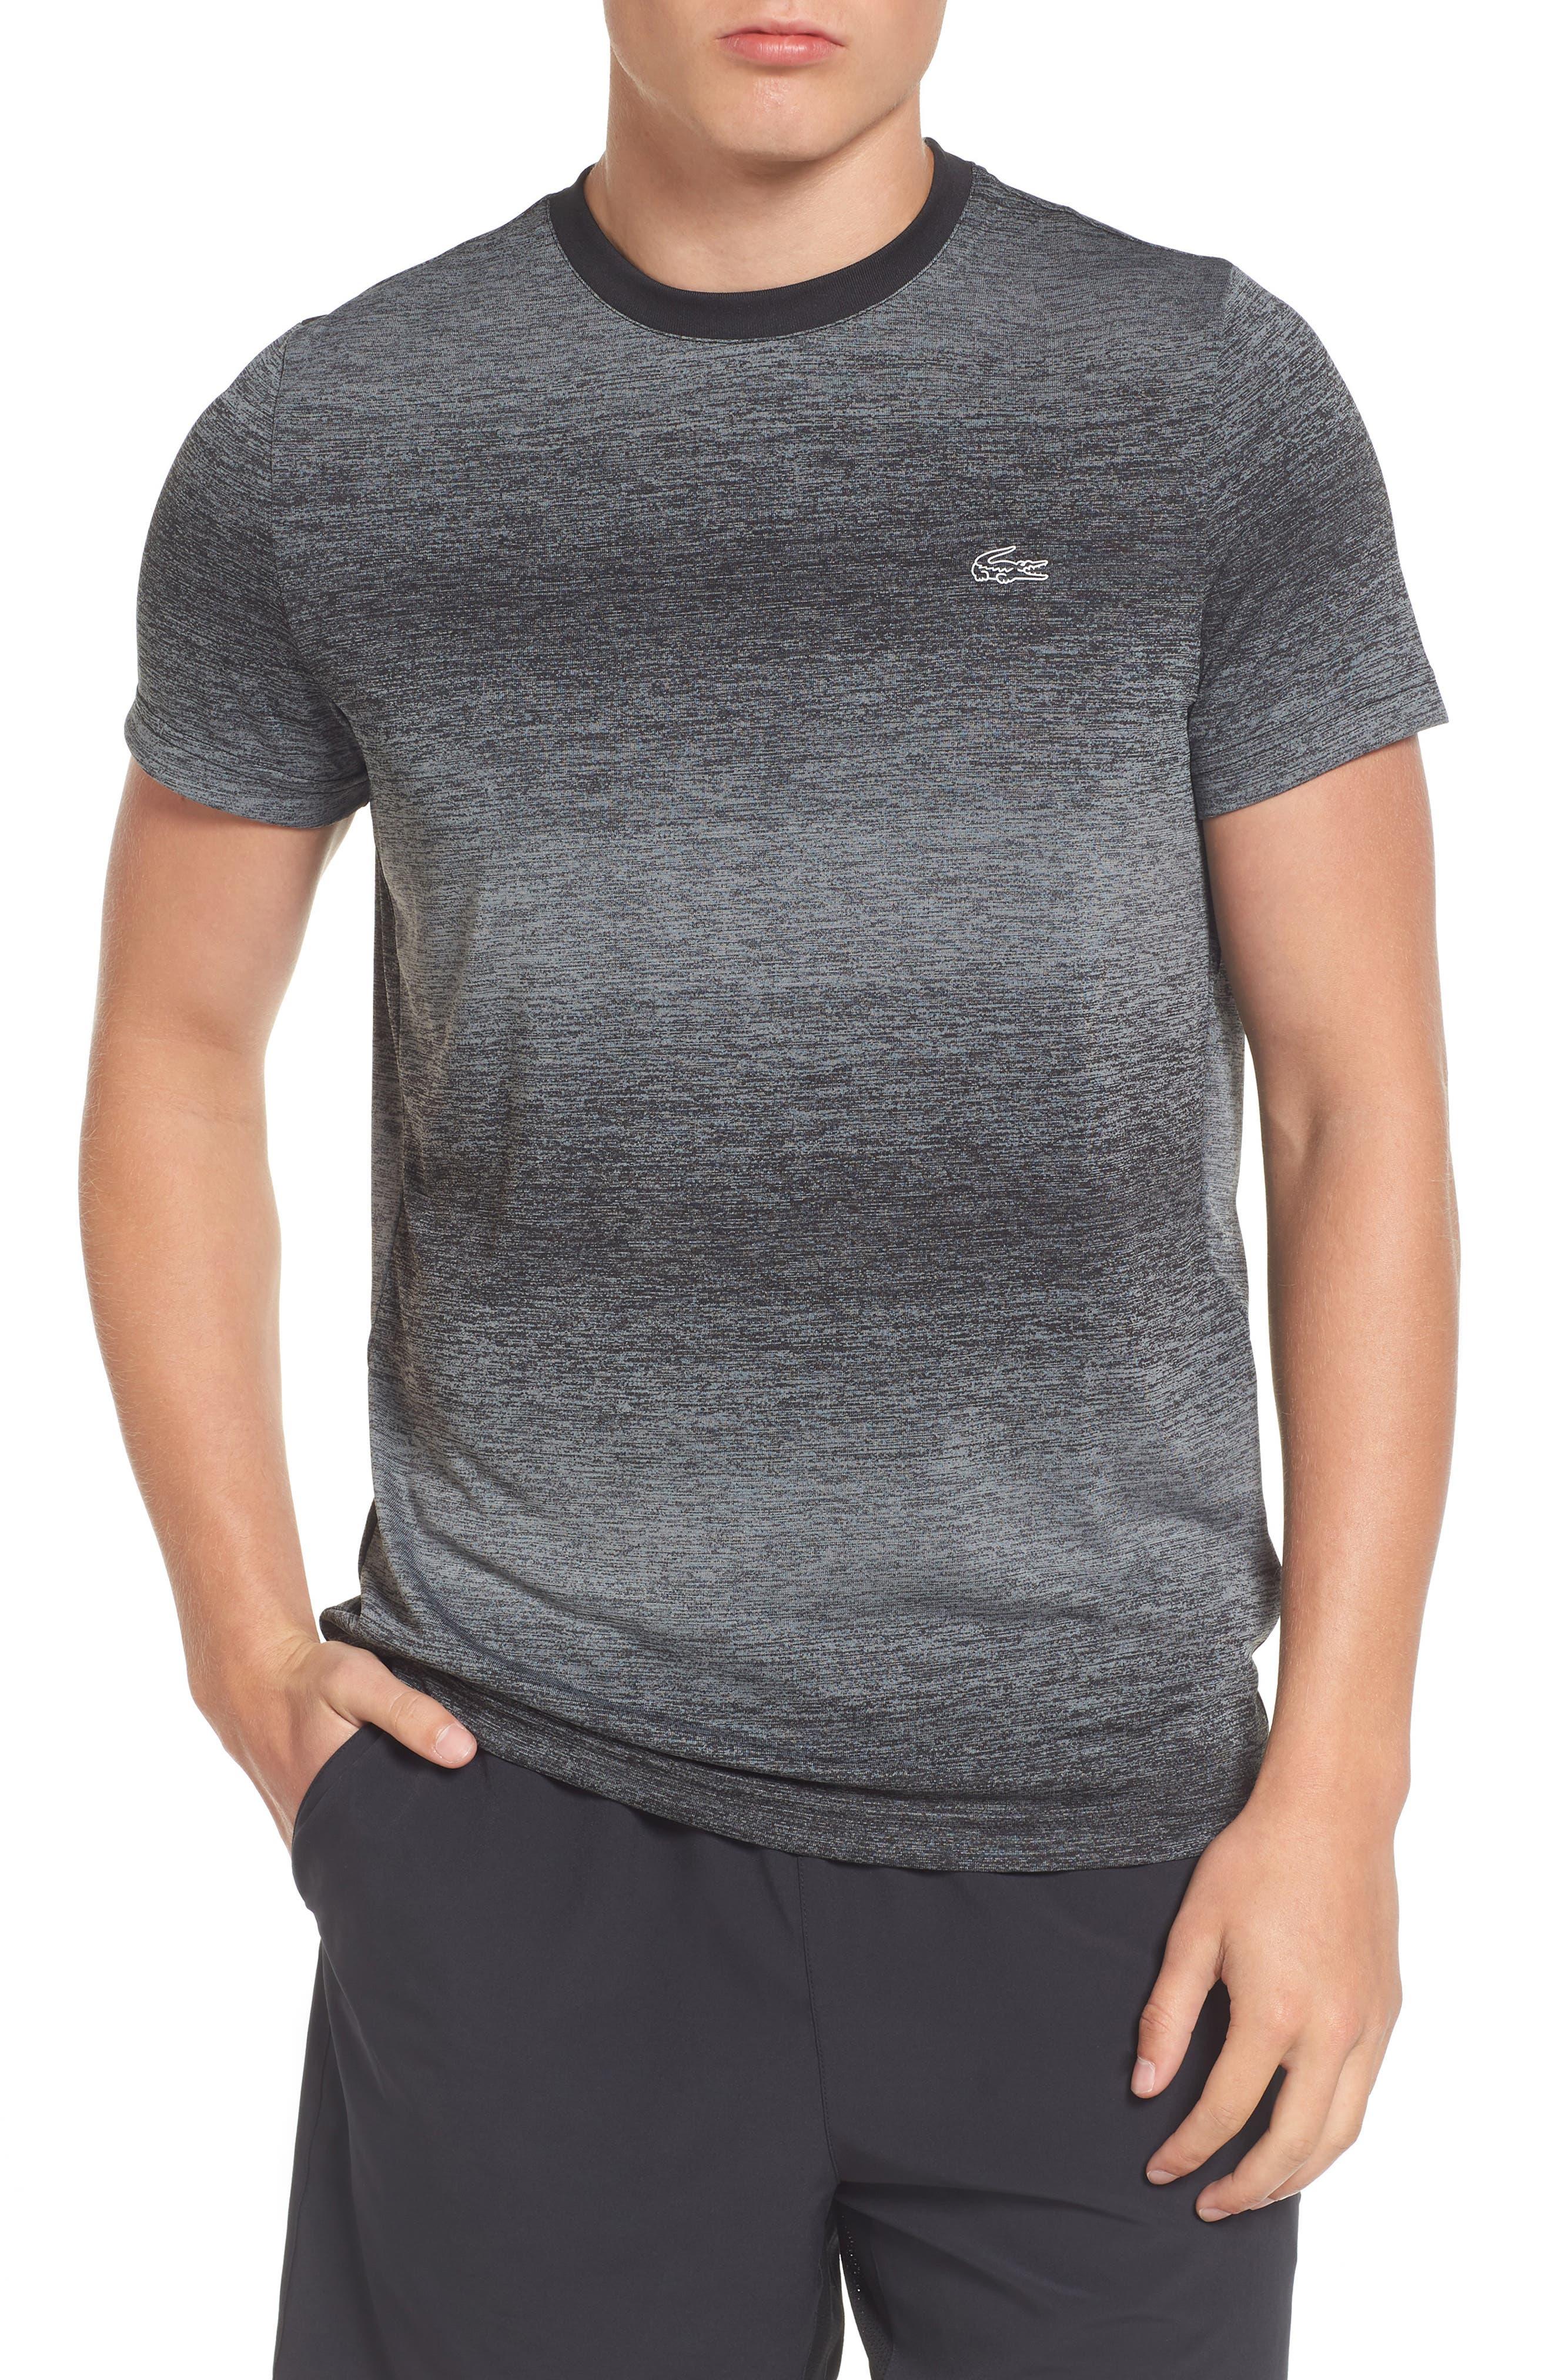 Ultra Dry Tech T-Shirt,                             Main thumbnail 1, color,                             Rk6 Black/ Black-Copper Orange